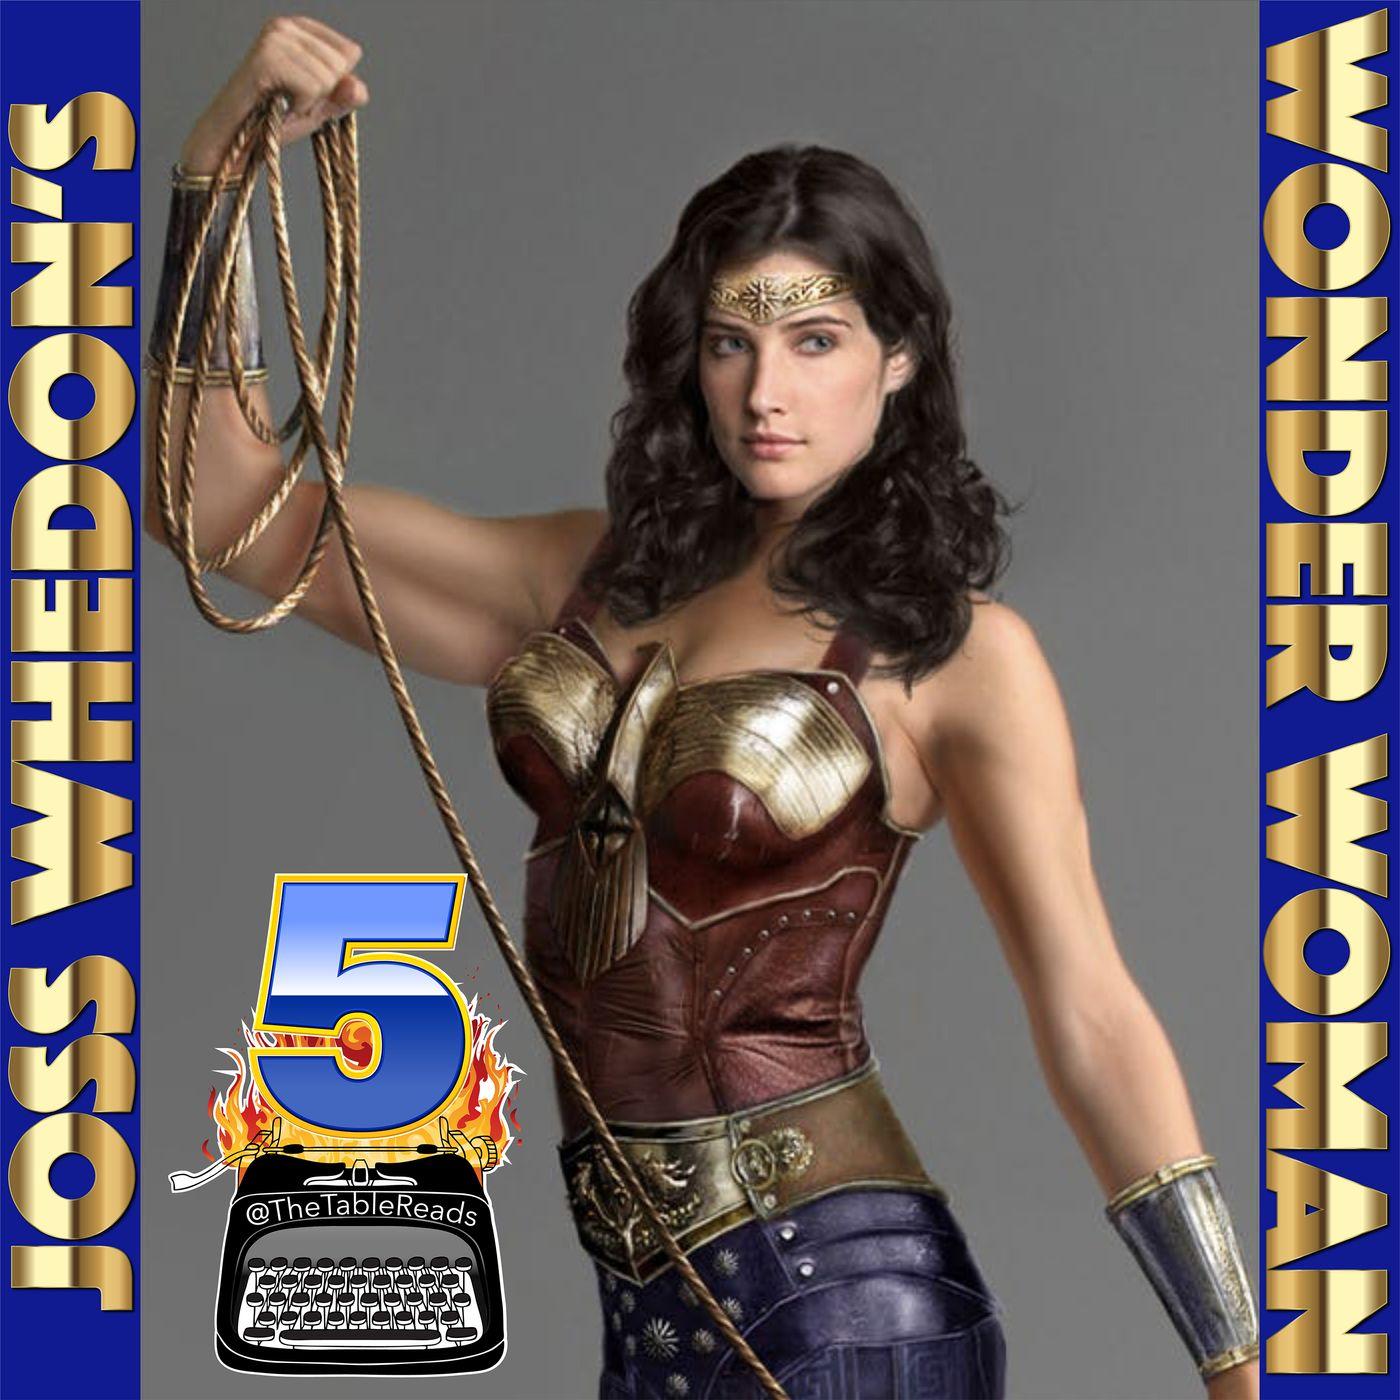 91 - Joss Whedon's Wonder Woman, Part 5 (Finale)